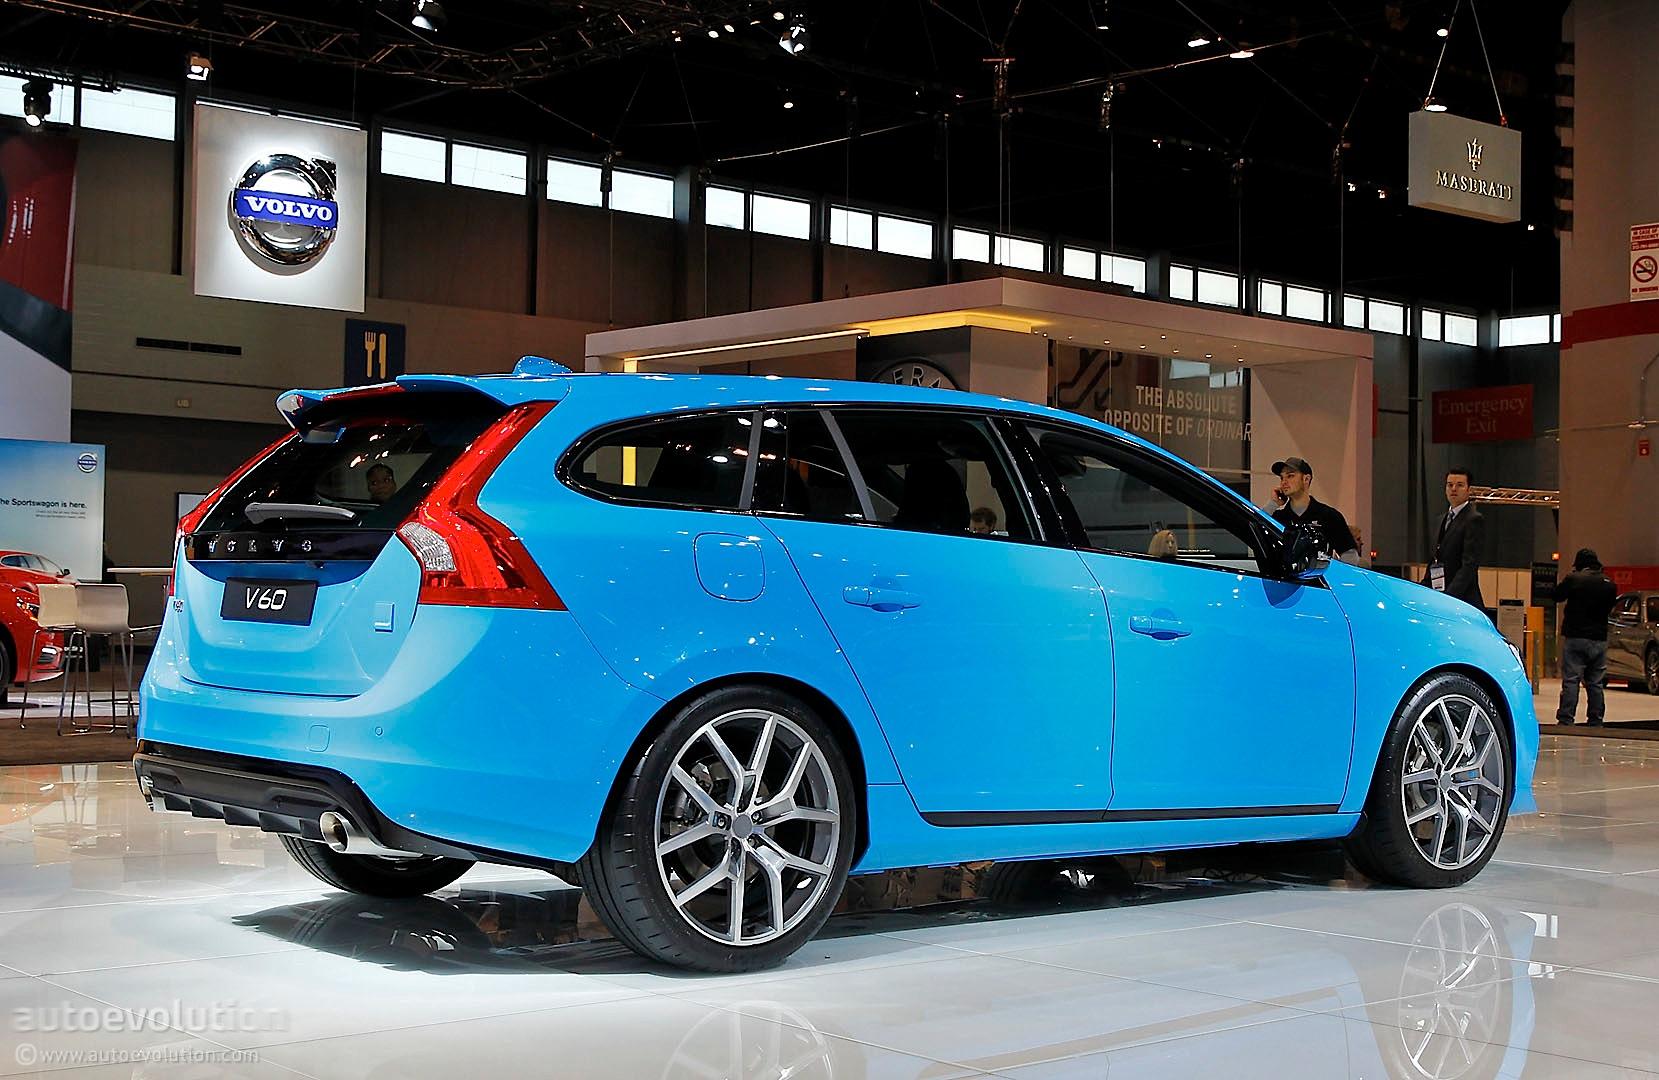 Volvo V60 Polestar Is A Blue Wagon In Chicago Live Photo